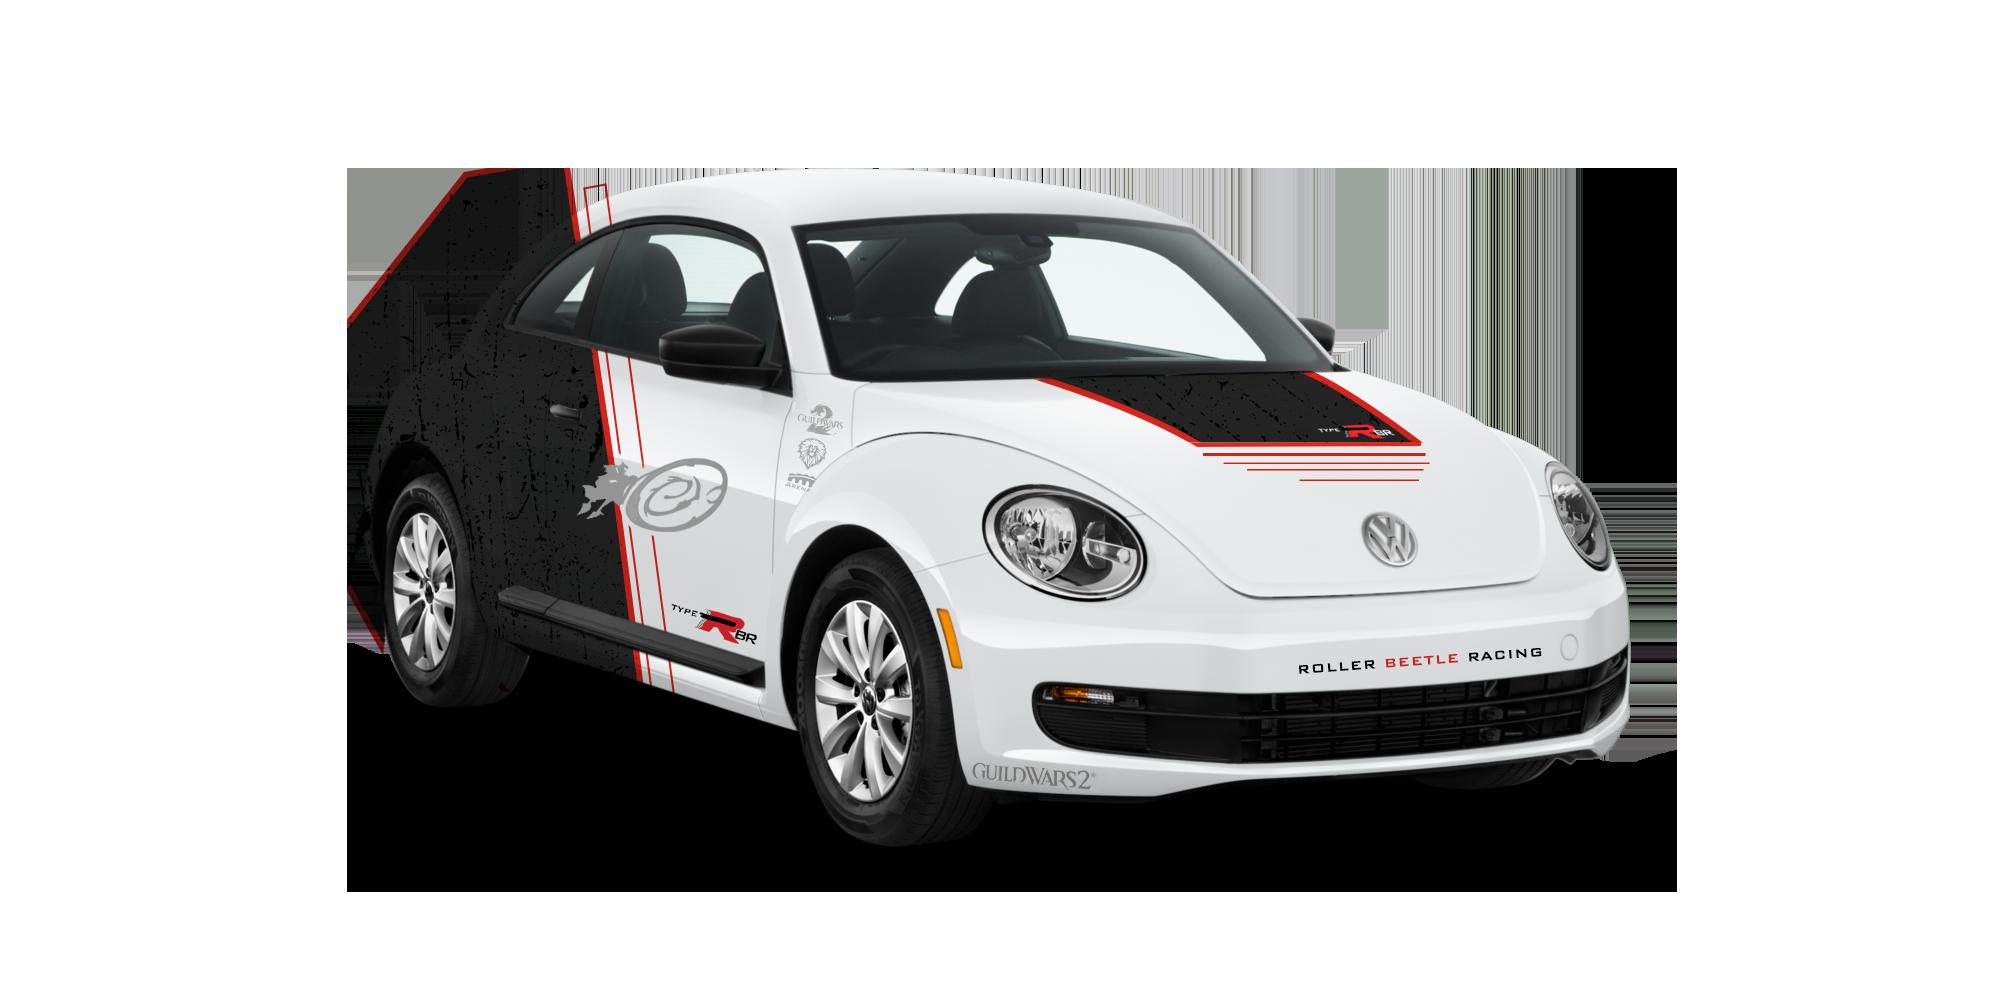 Roller Beetle Racing Is Drifting Your Way Guildwars2 Com